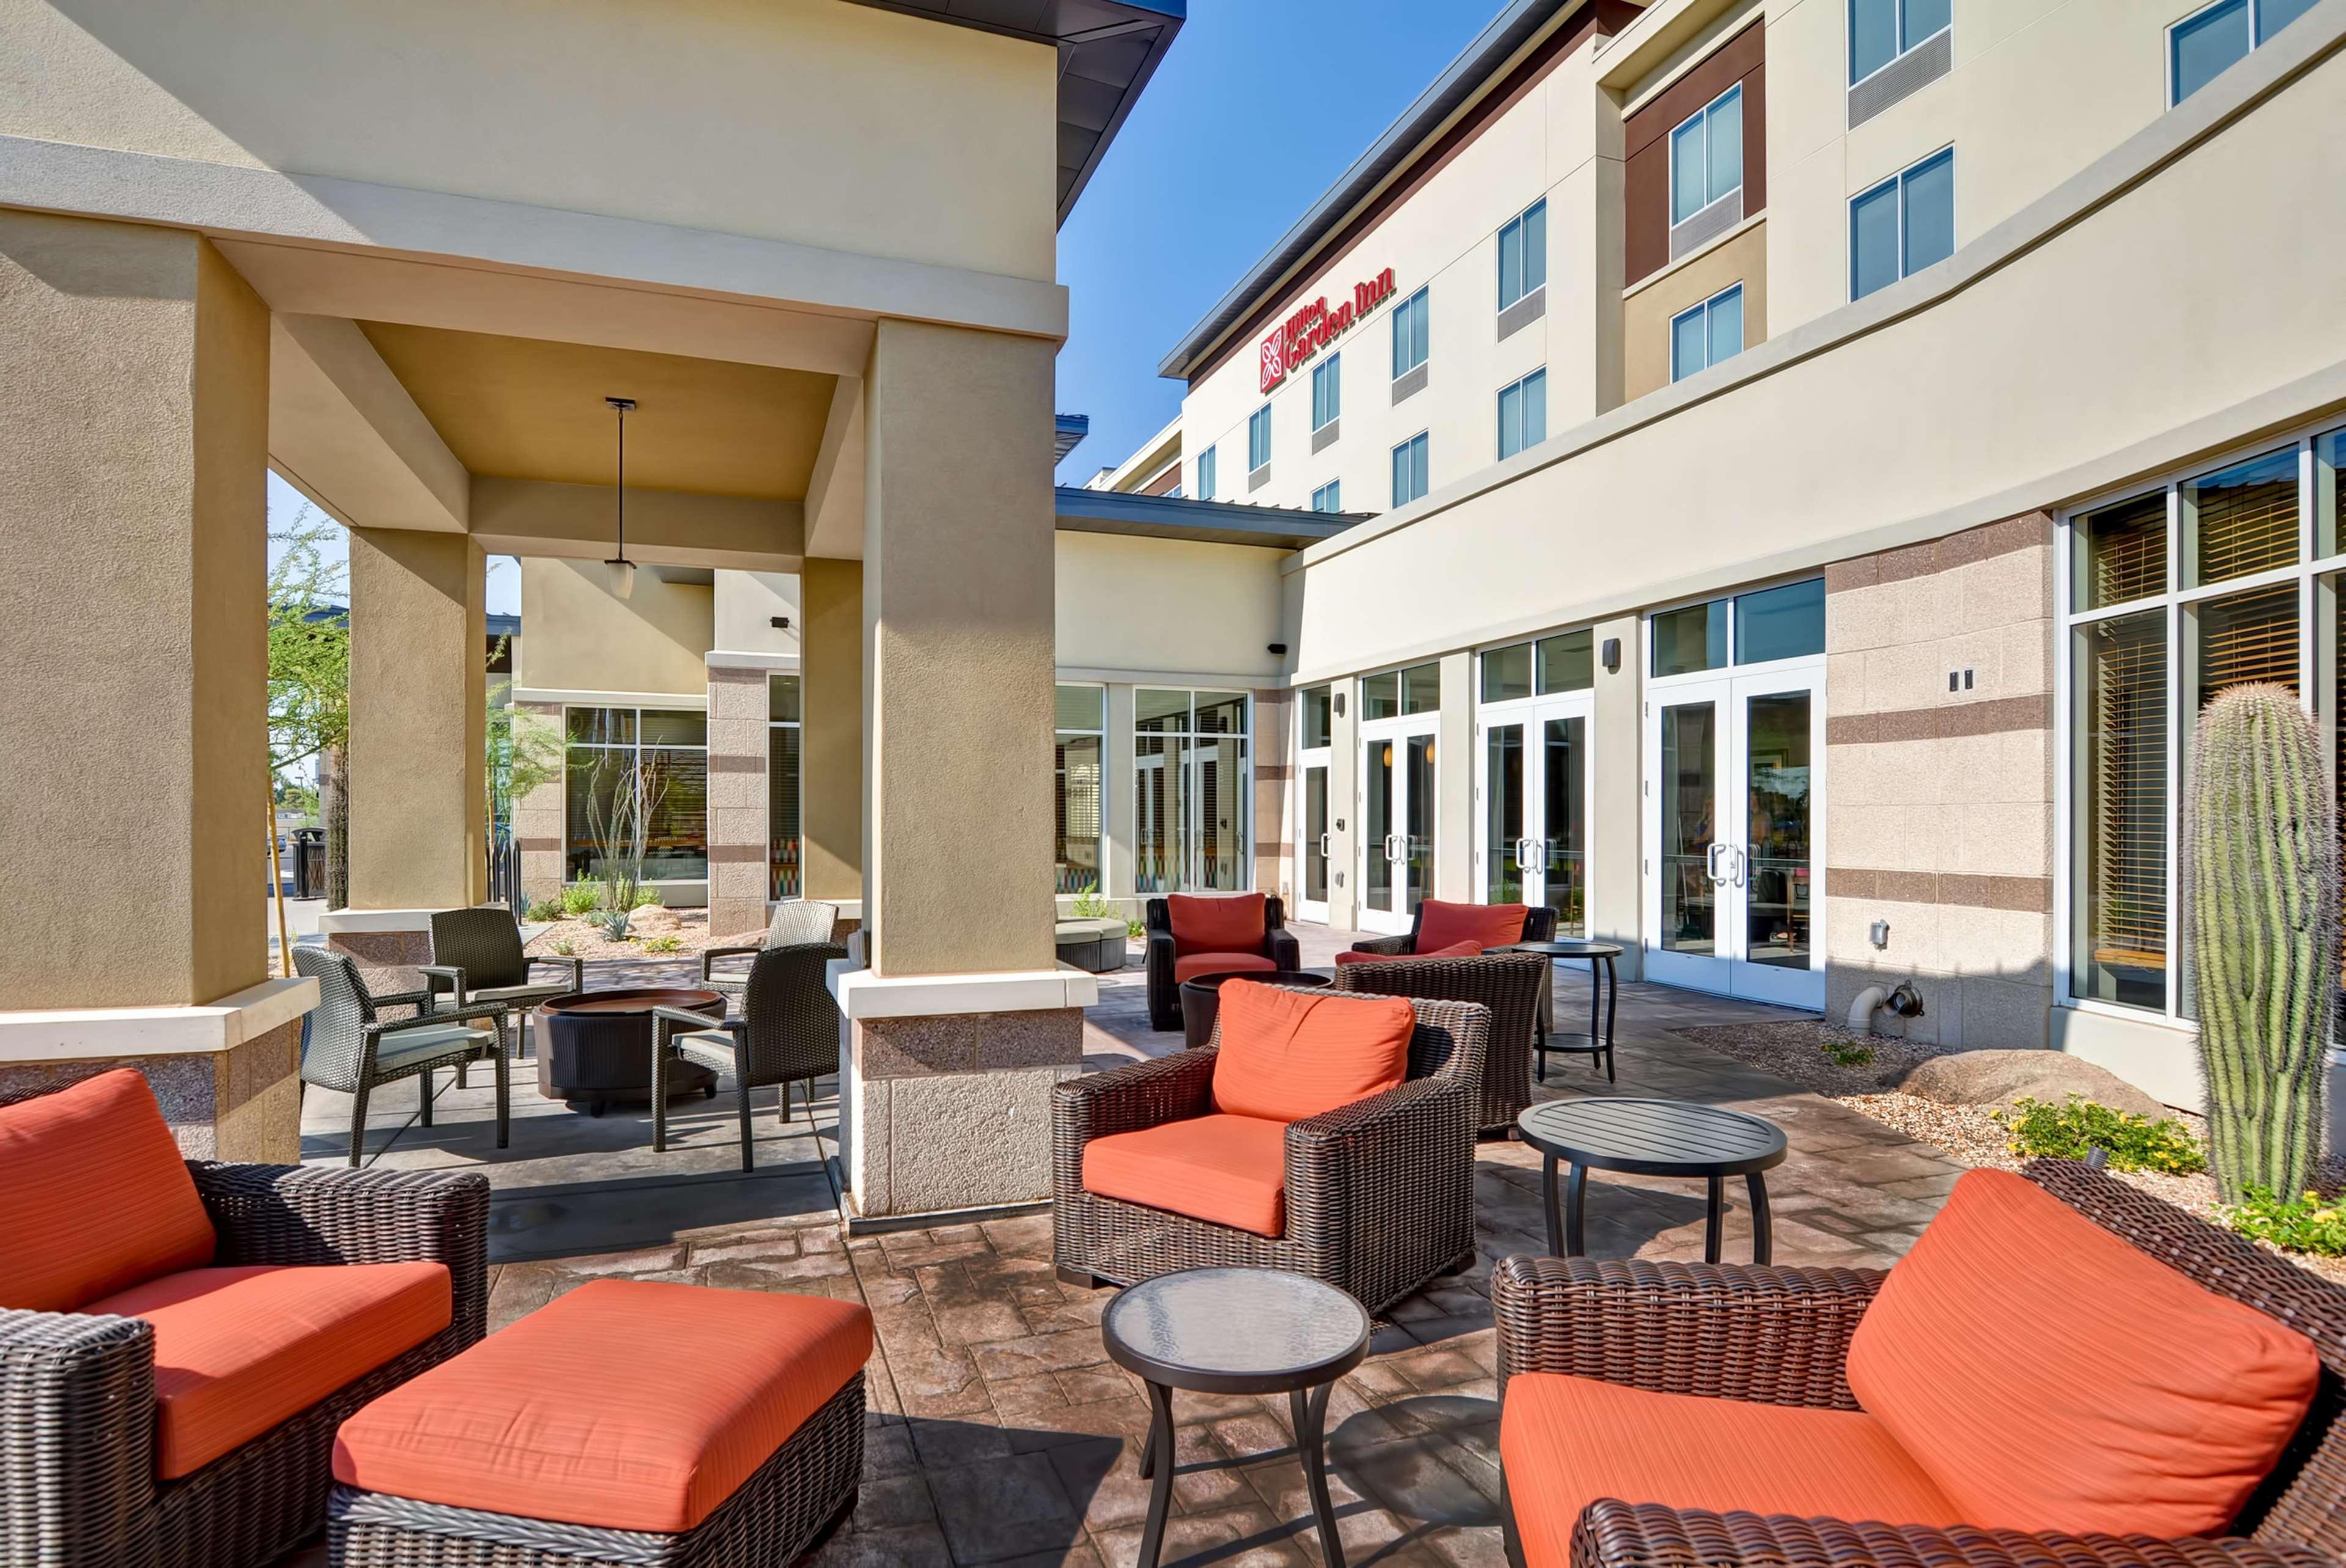 Hilton Garden Inn Phoenix/Tempe ASU Area image 0